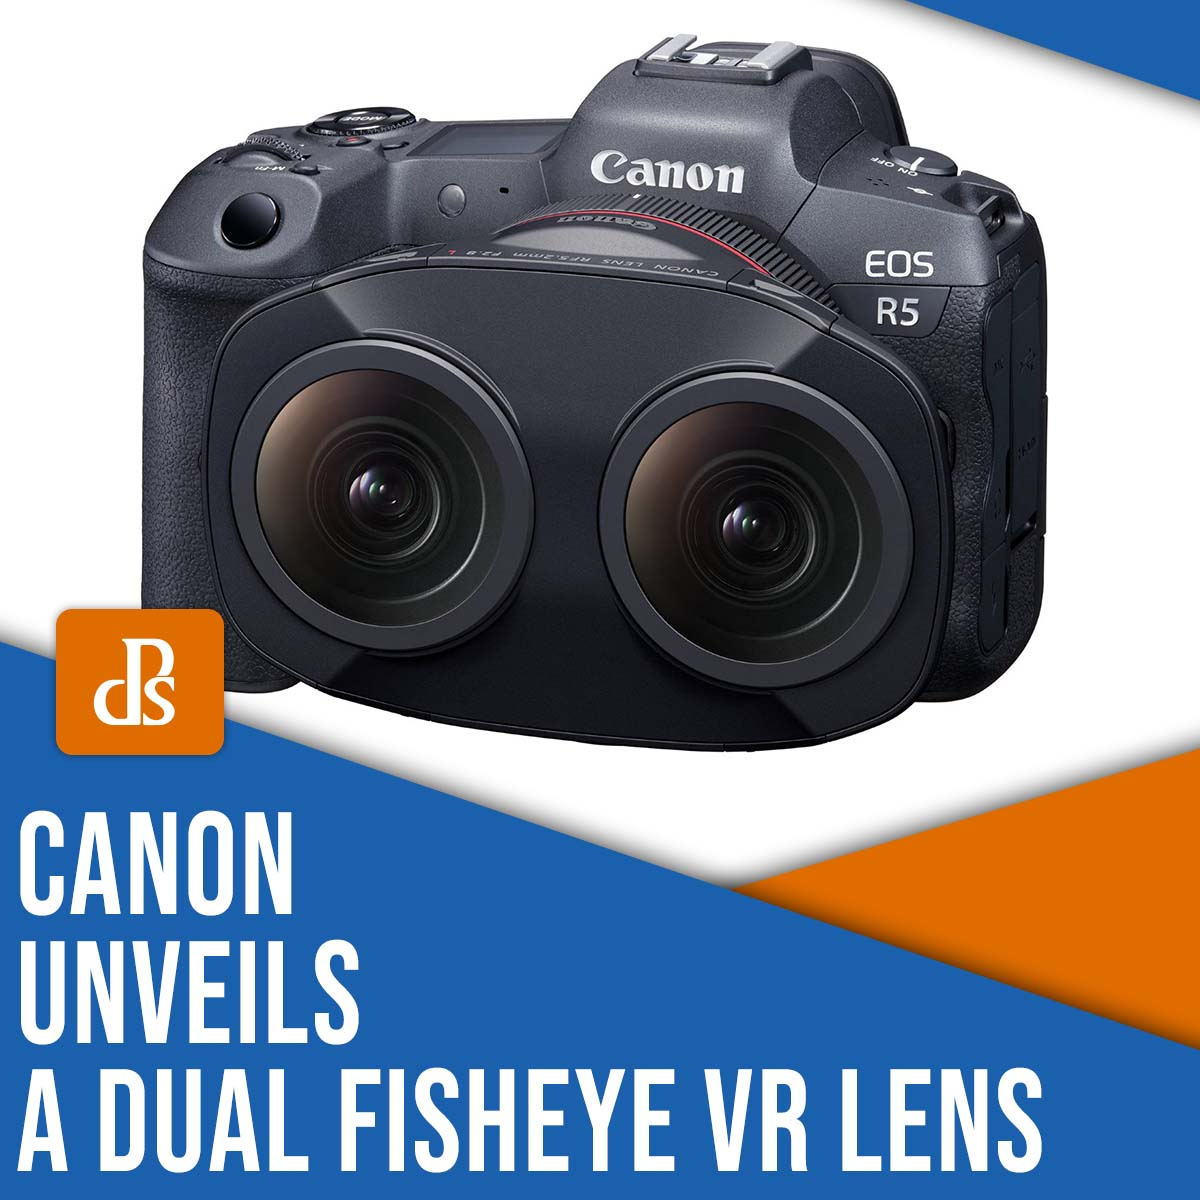 Canon unveils a dual fisheye VR lens